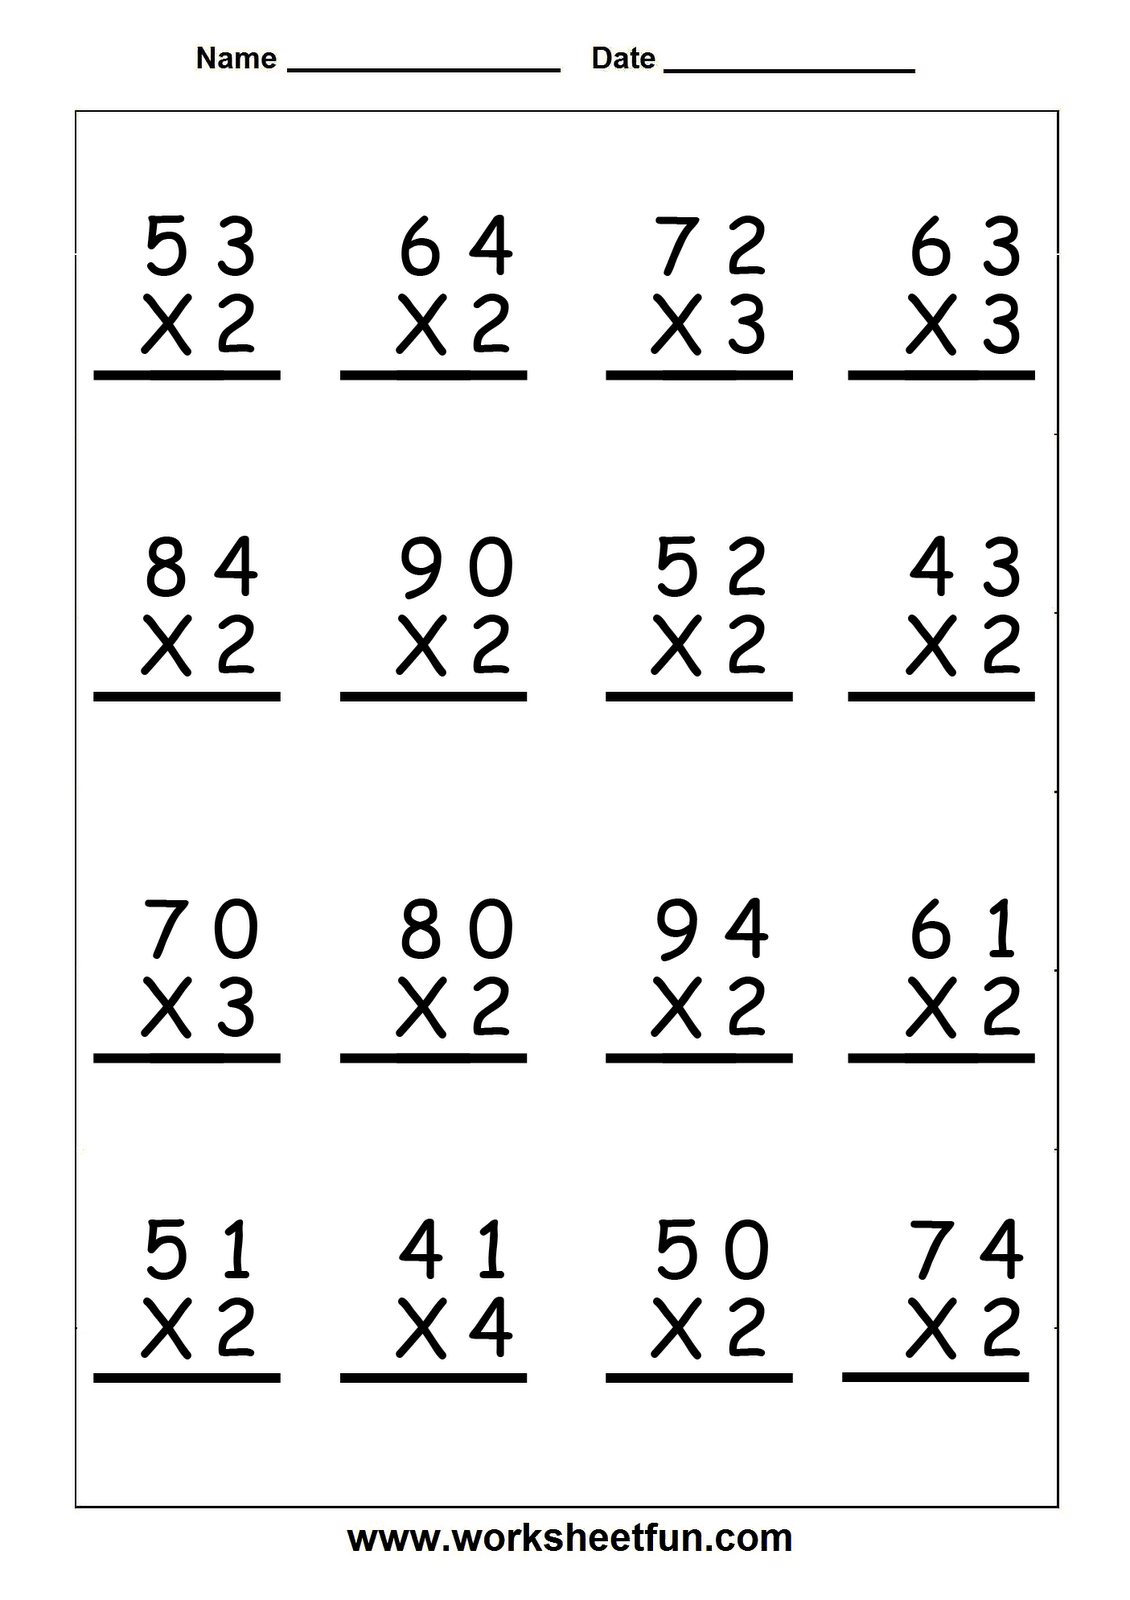 https://dubaikhalifas.com/1st-grade-measurement-activities-5th-grade-multiplication-test-4th-grade-math-worksheets/ [ 400 x 1600 Pixel ]